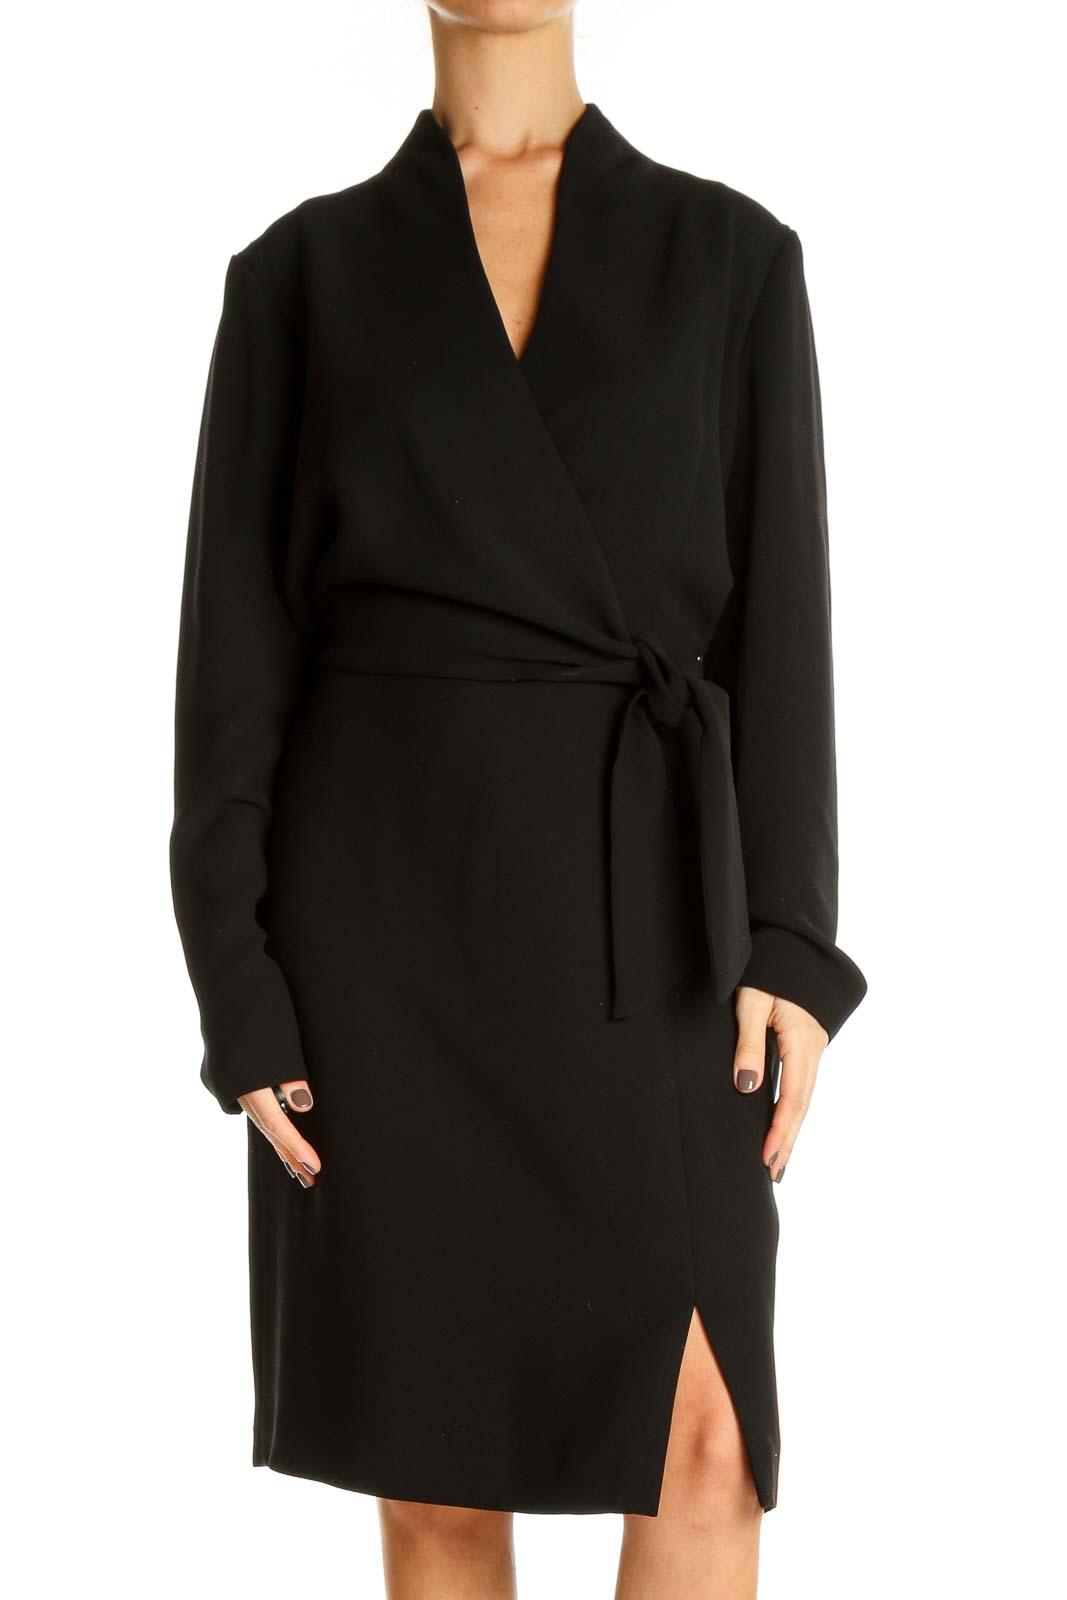 Black Solid Work Sheath Dress Front